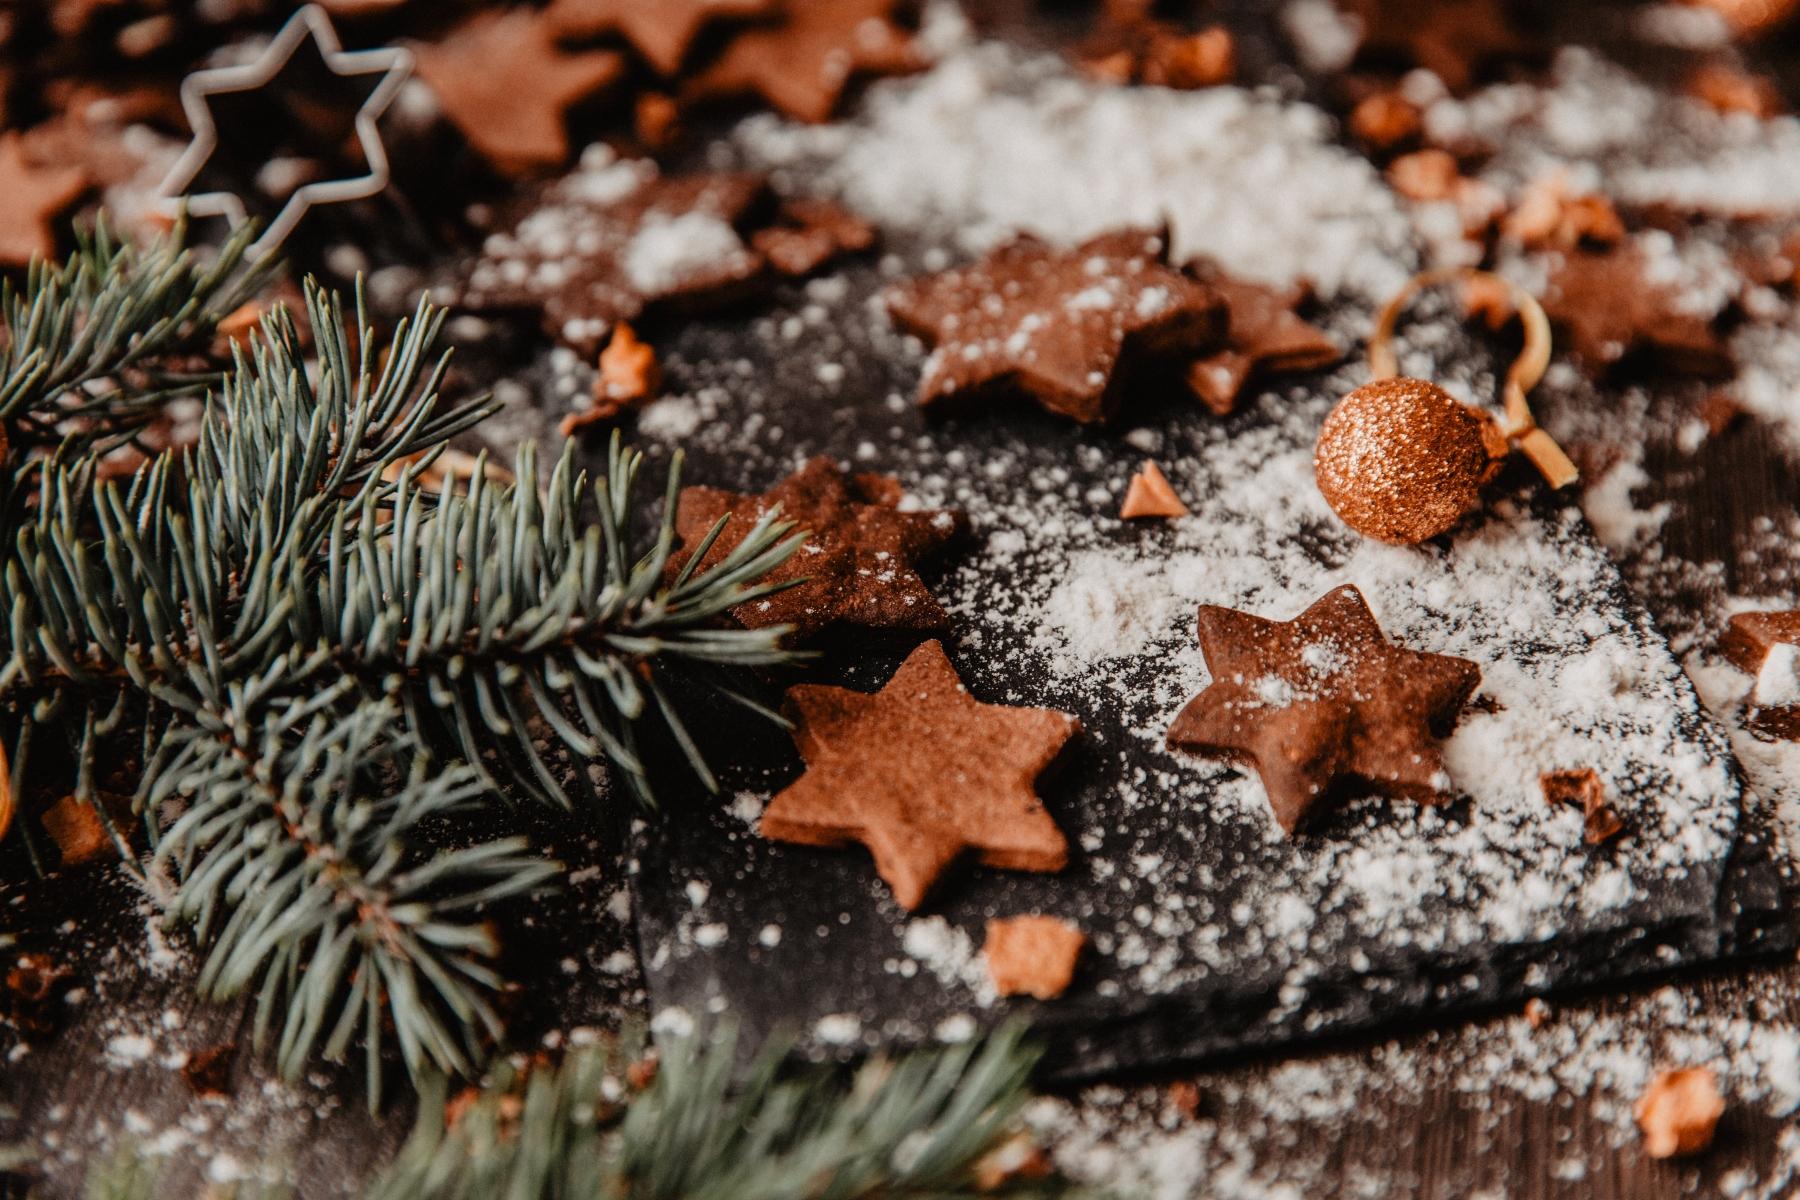 Green Christmas Selbstgebackene Kekse verschenken – ©Unsplash